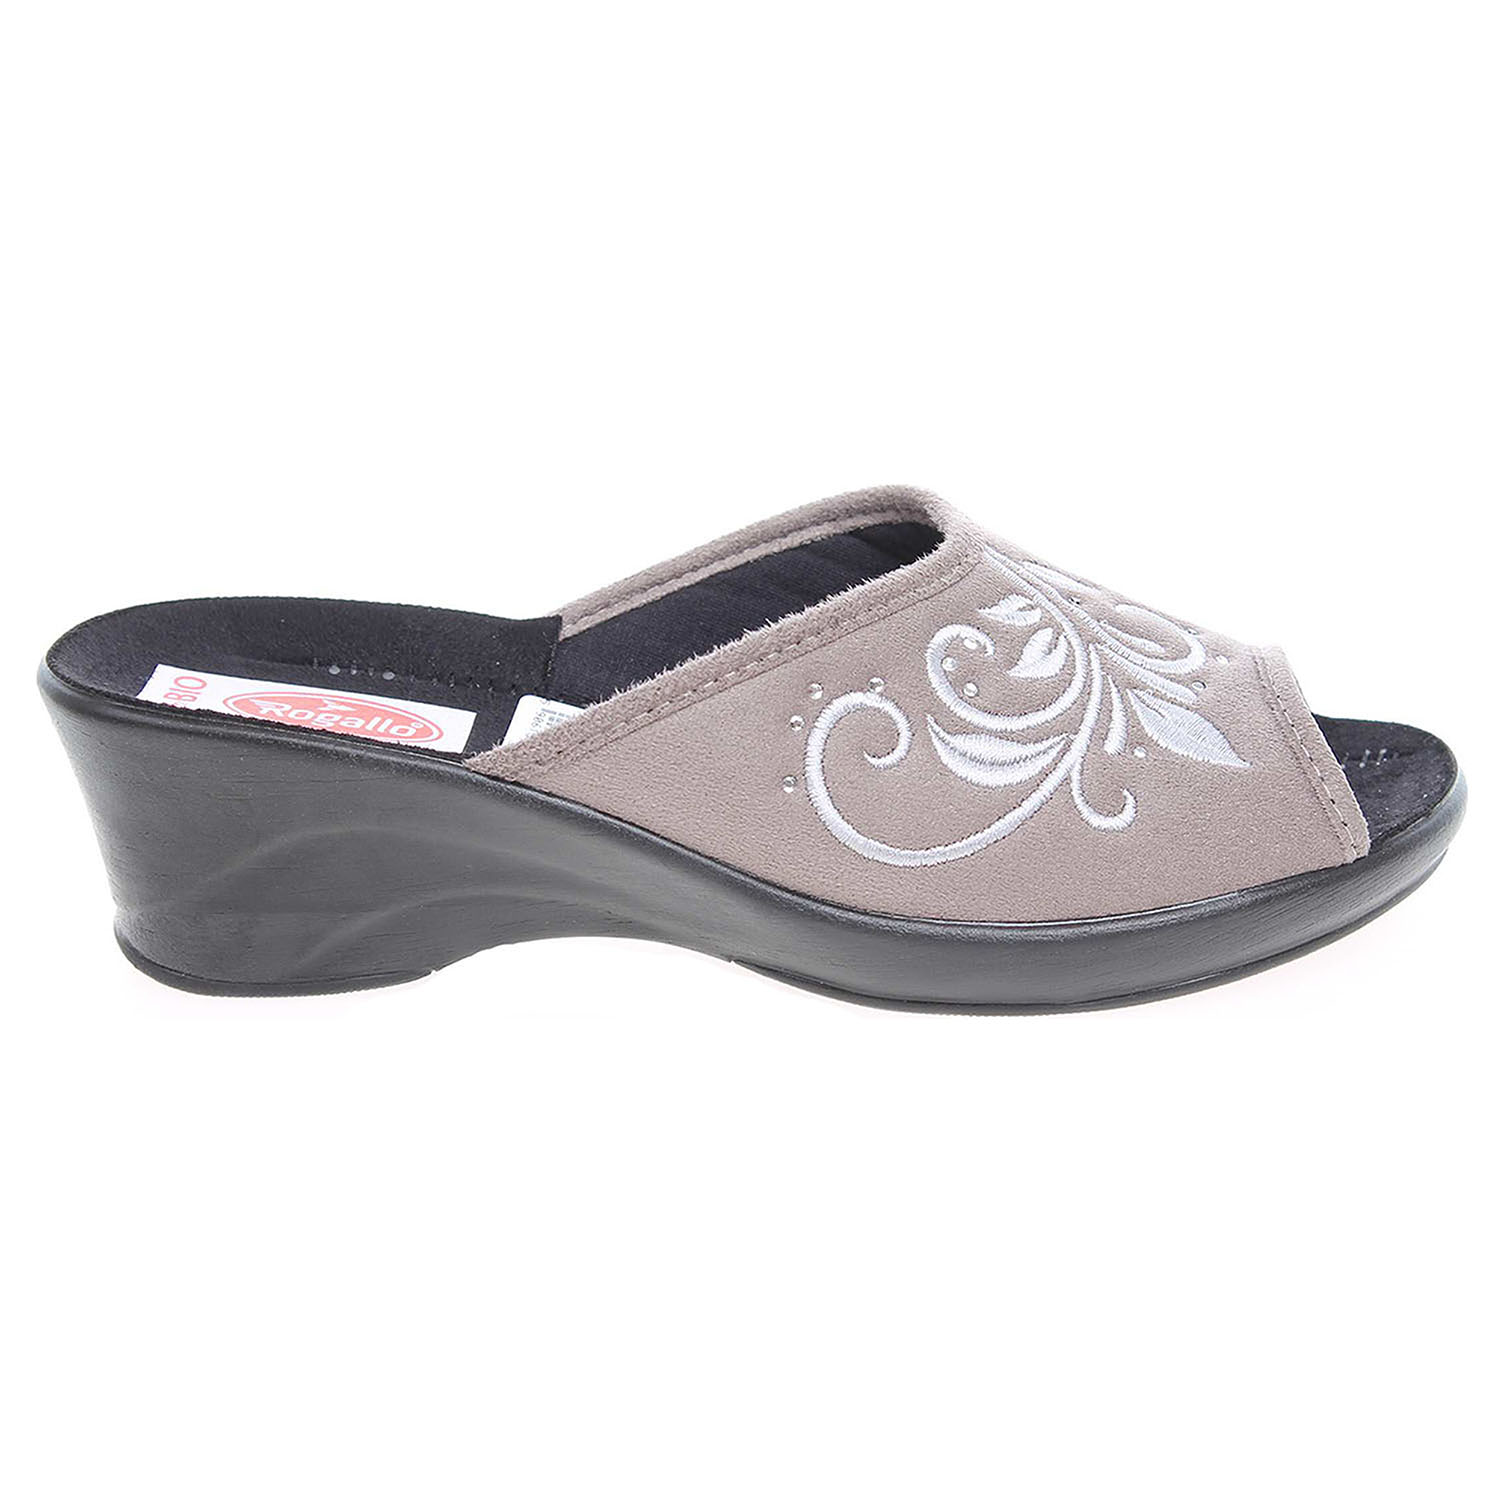 Rogallo dámské pantofle 21038 šedé 41